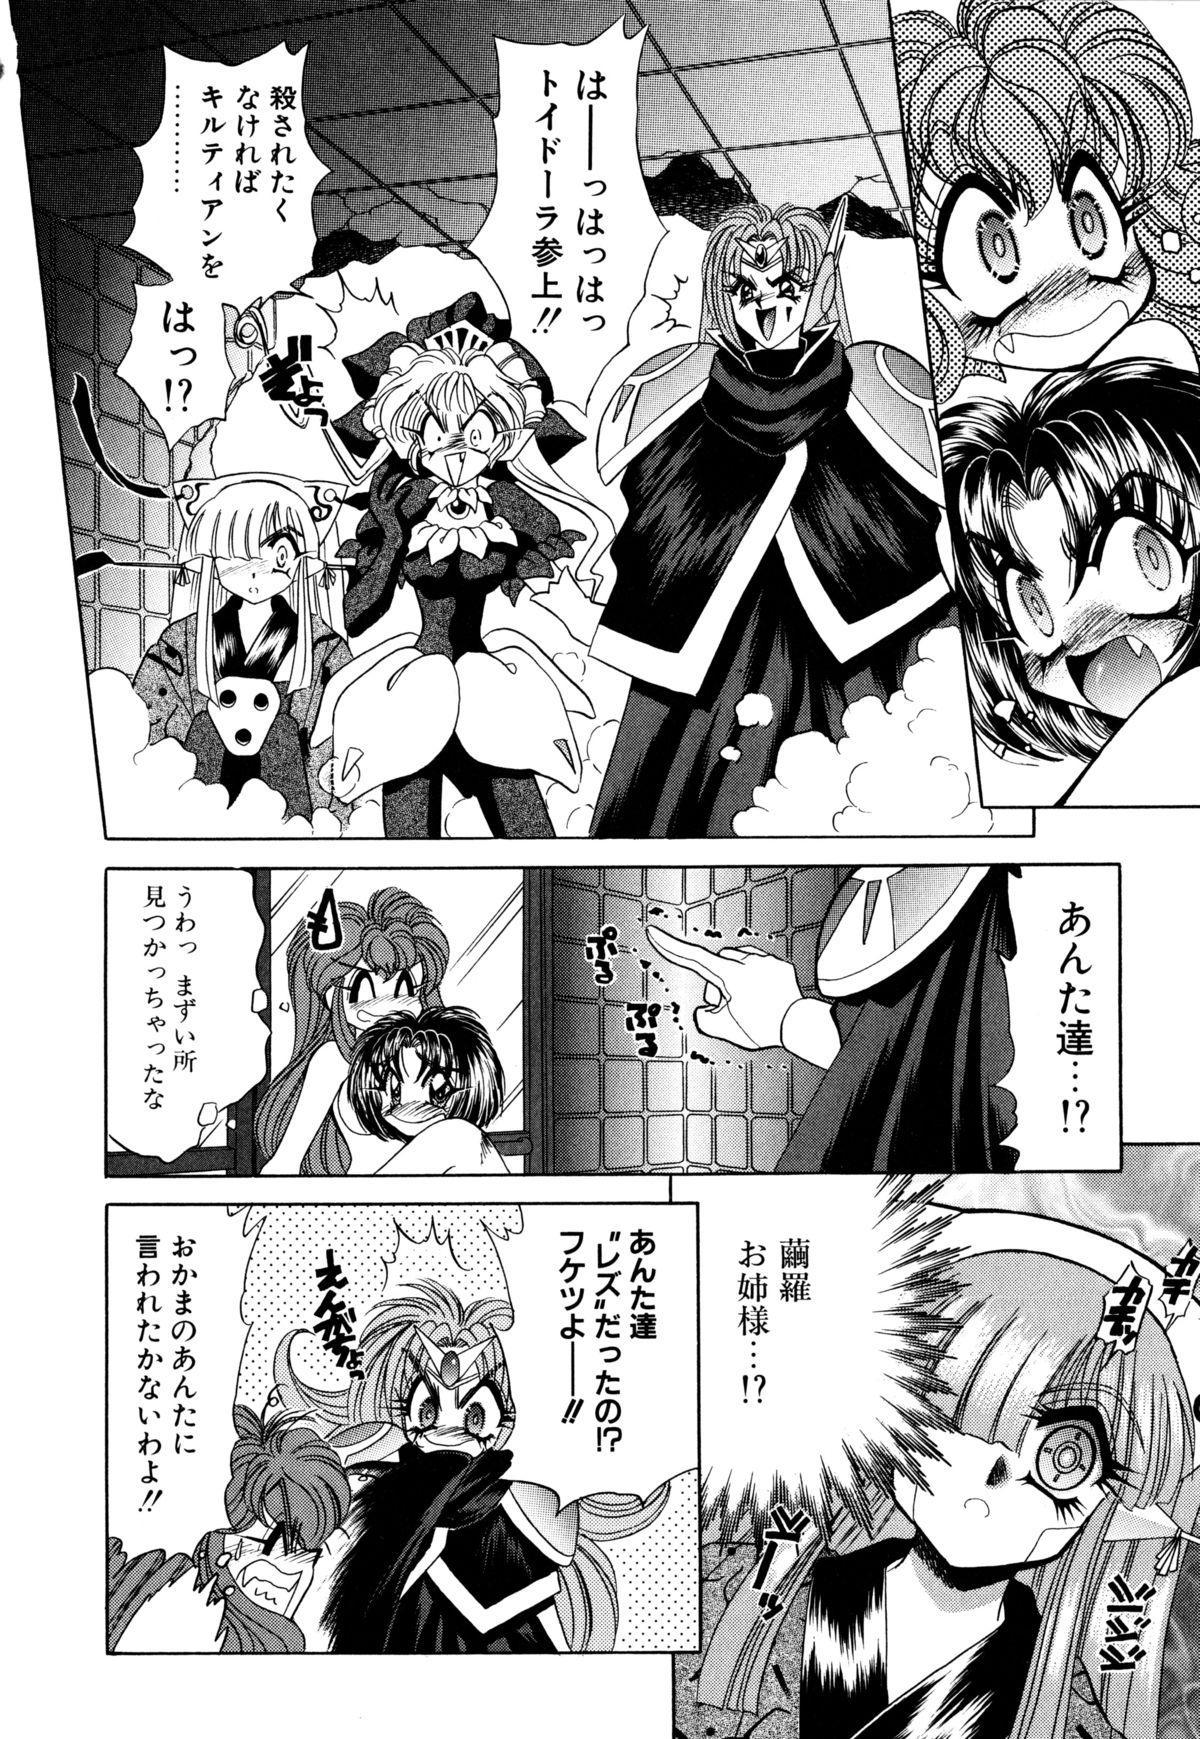 Kigurumi Sentai Quiltian 150